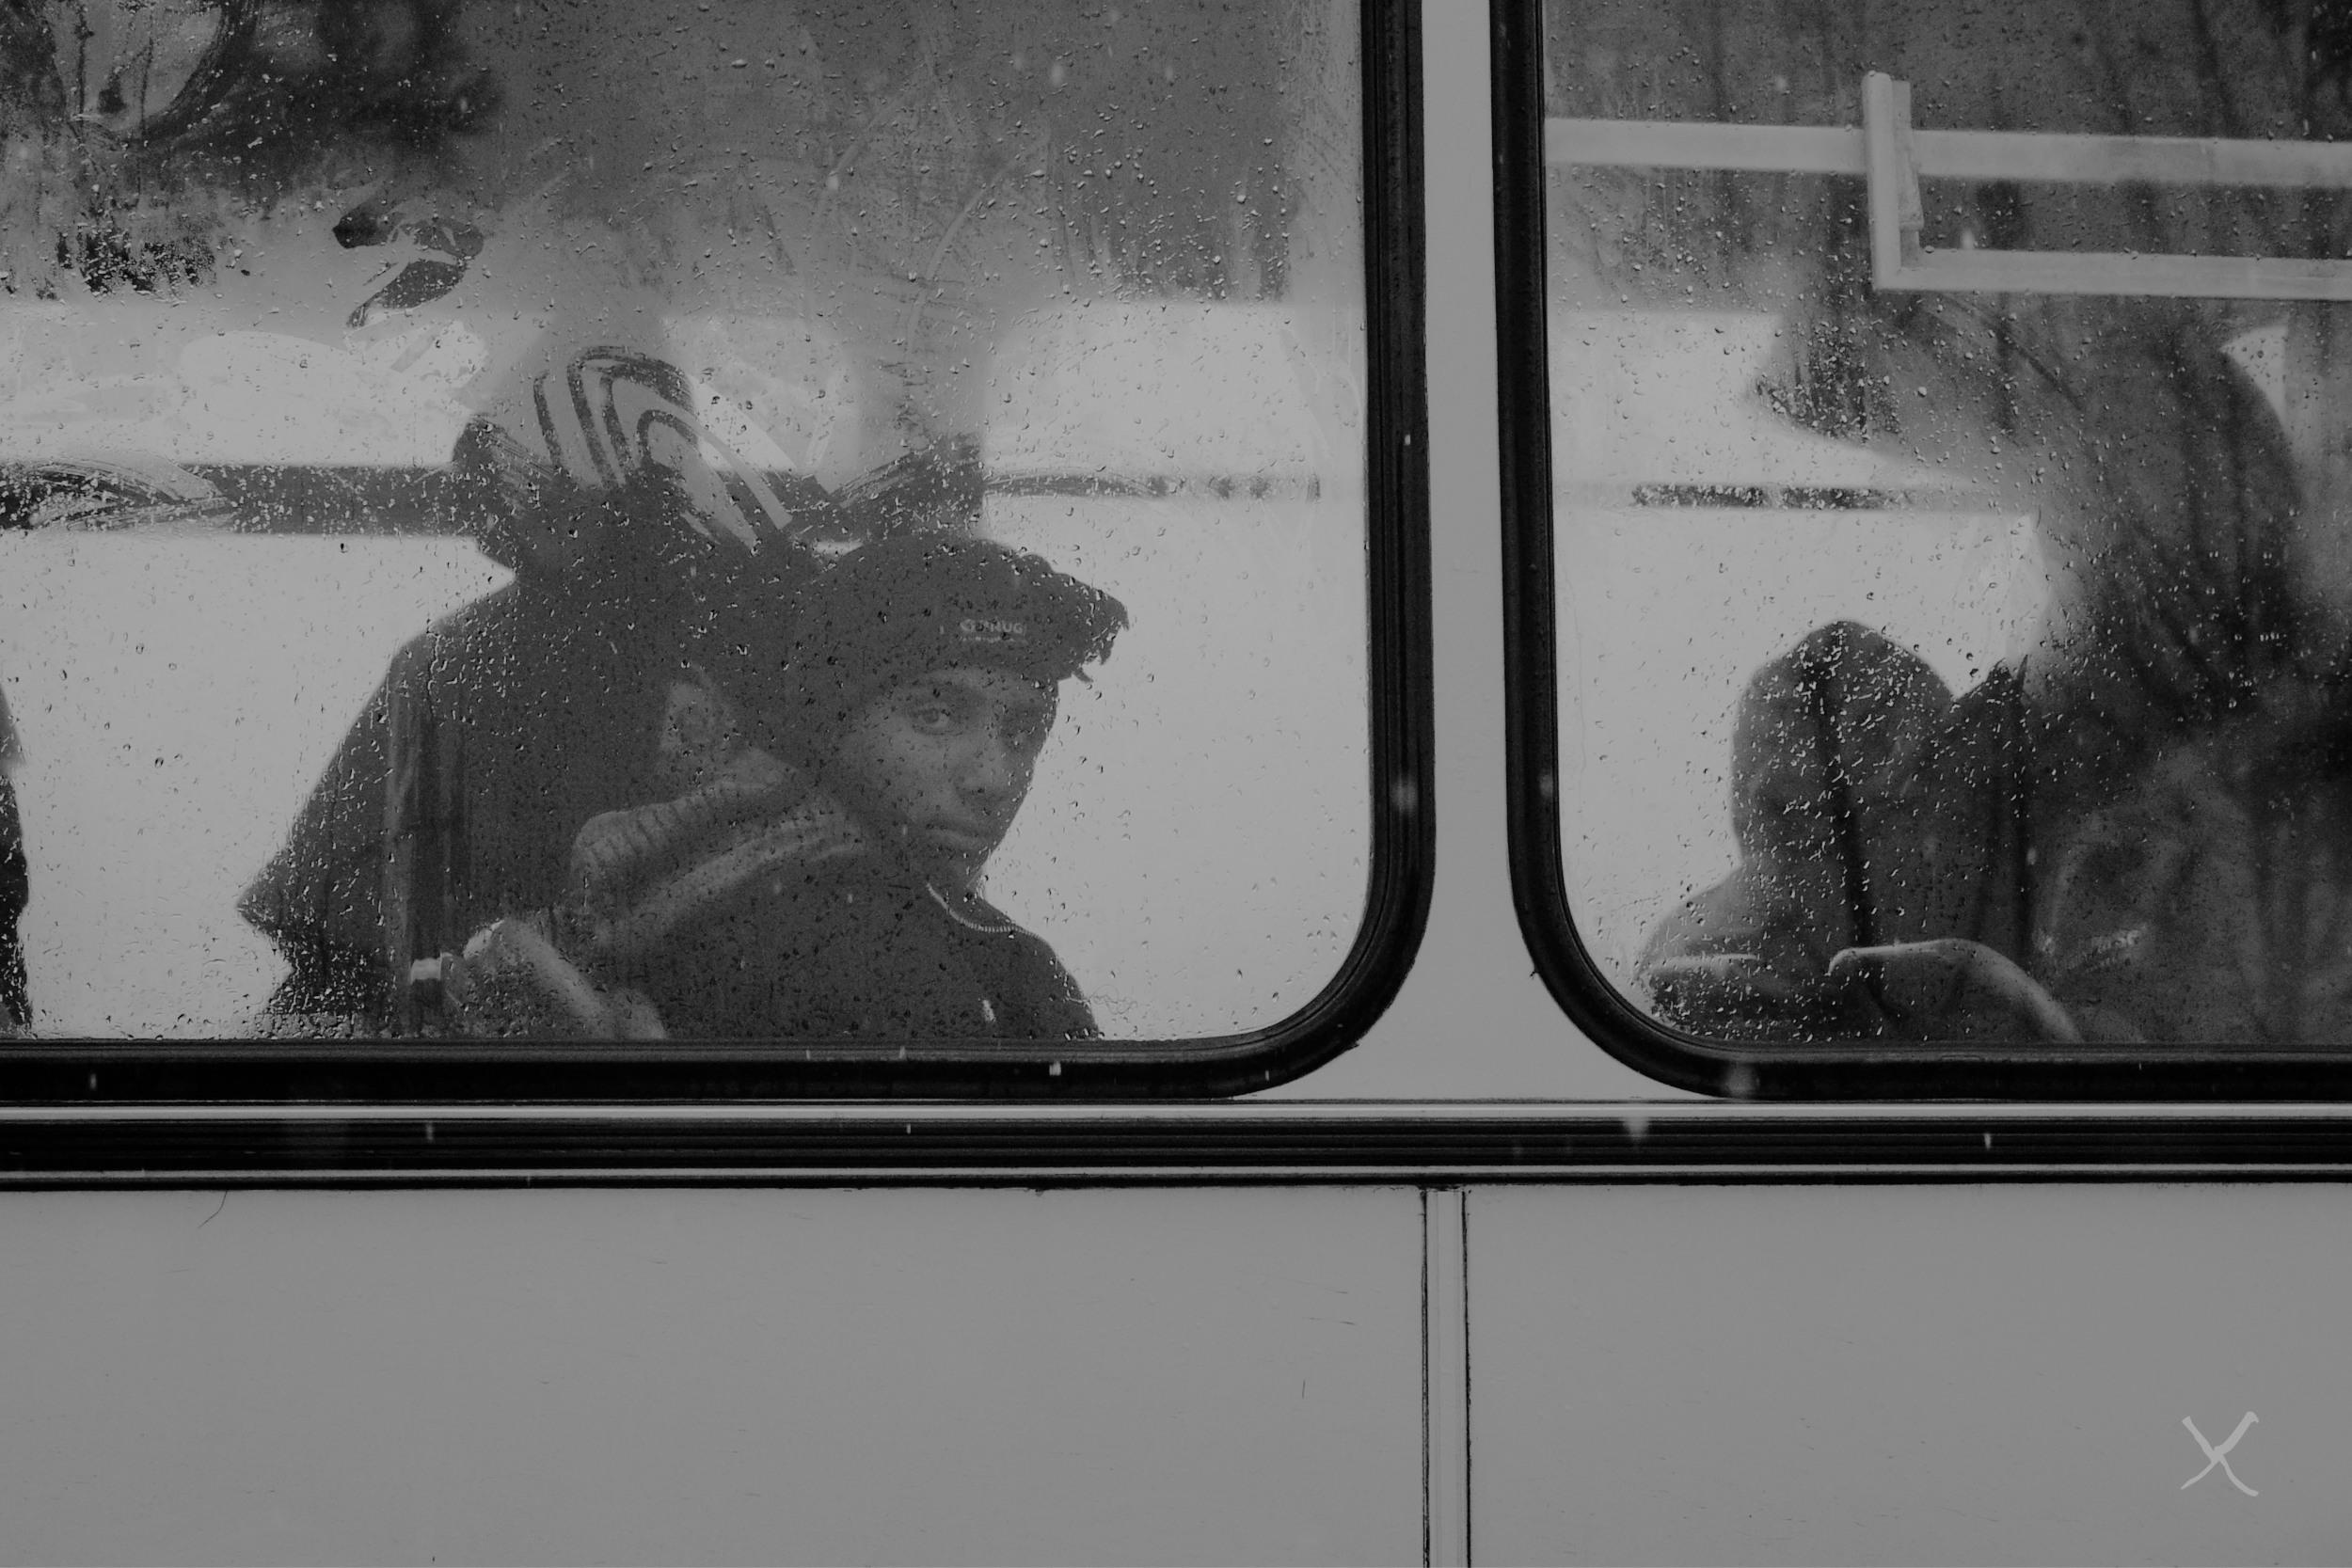 Refugeeonbus.jpg